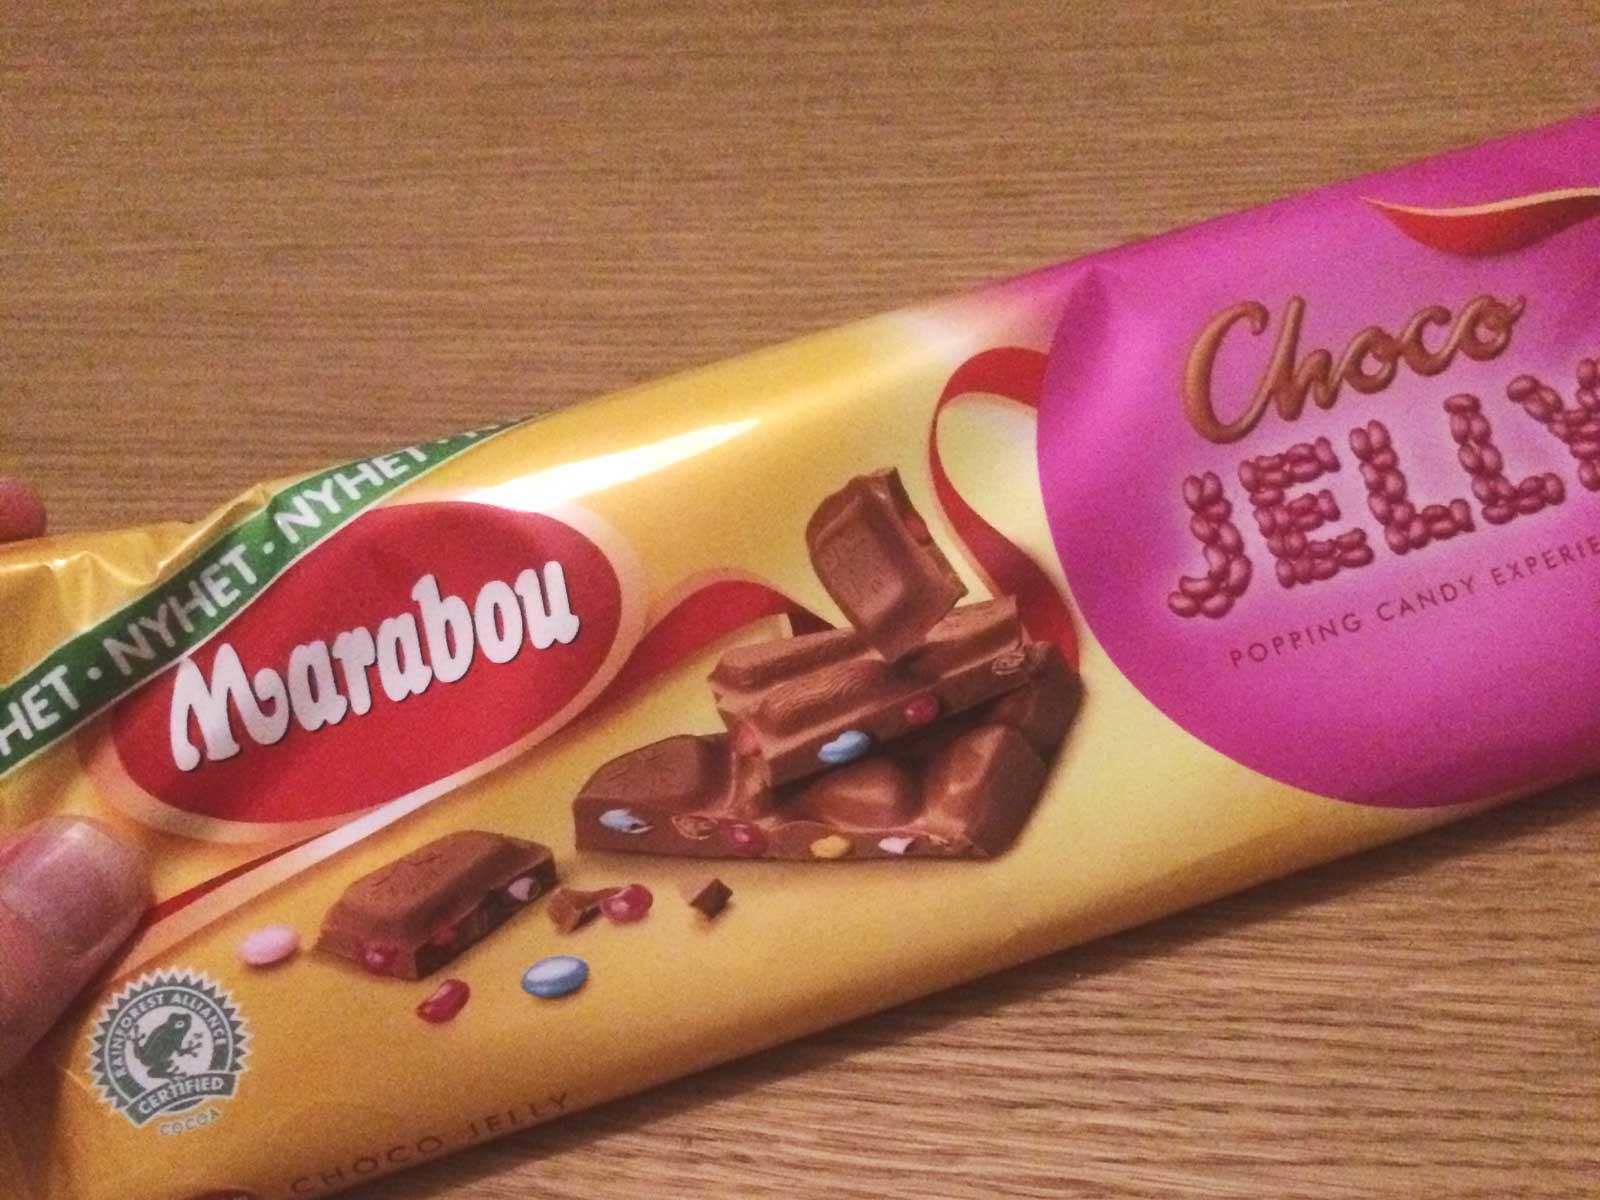 Marabou Choco Jelly